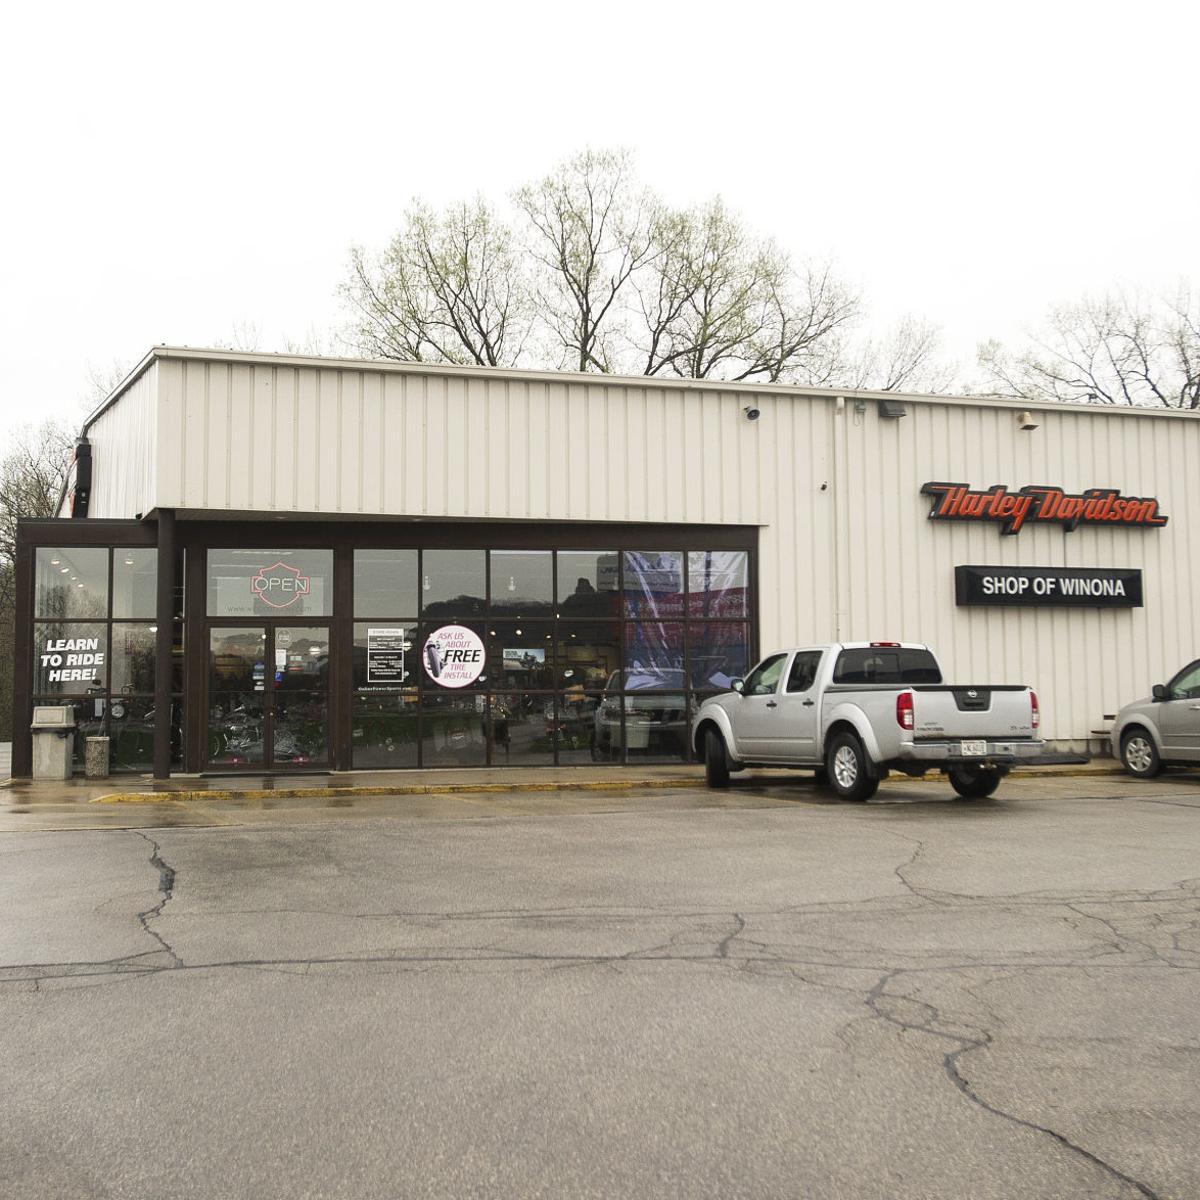 Harley Davidson Dealers Near Me >> Harley Davidson Dealership In Winona To Close May 25 Local